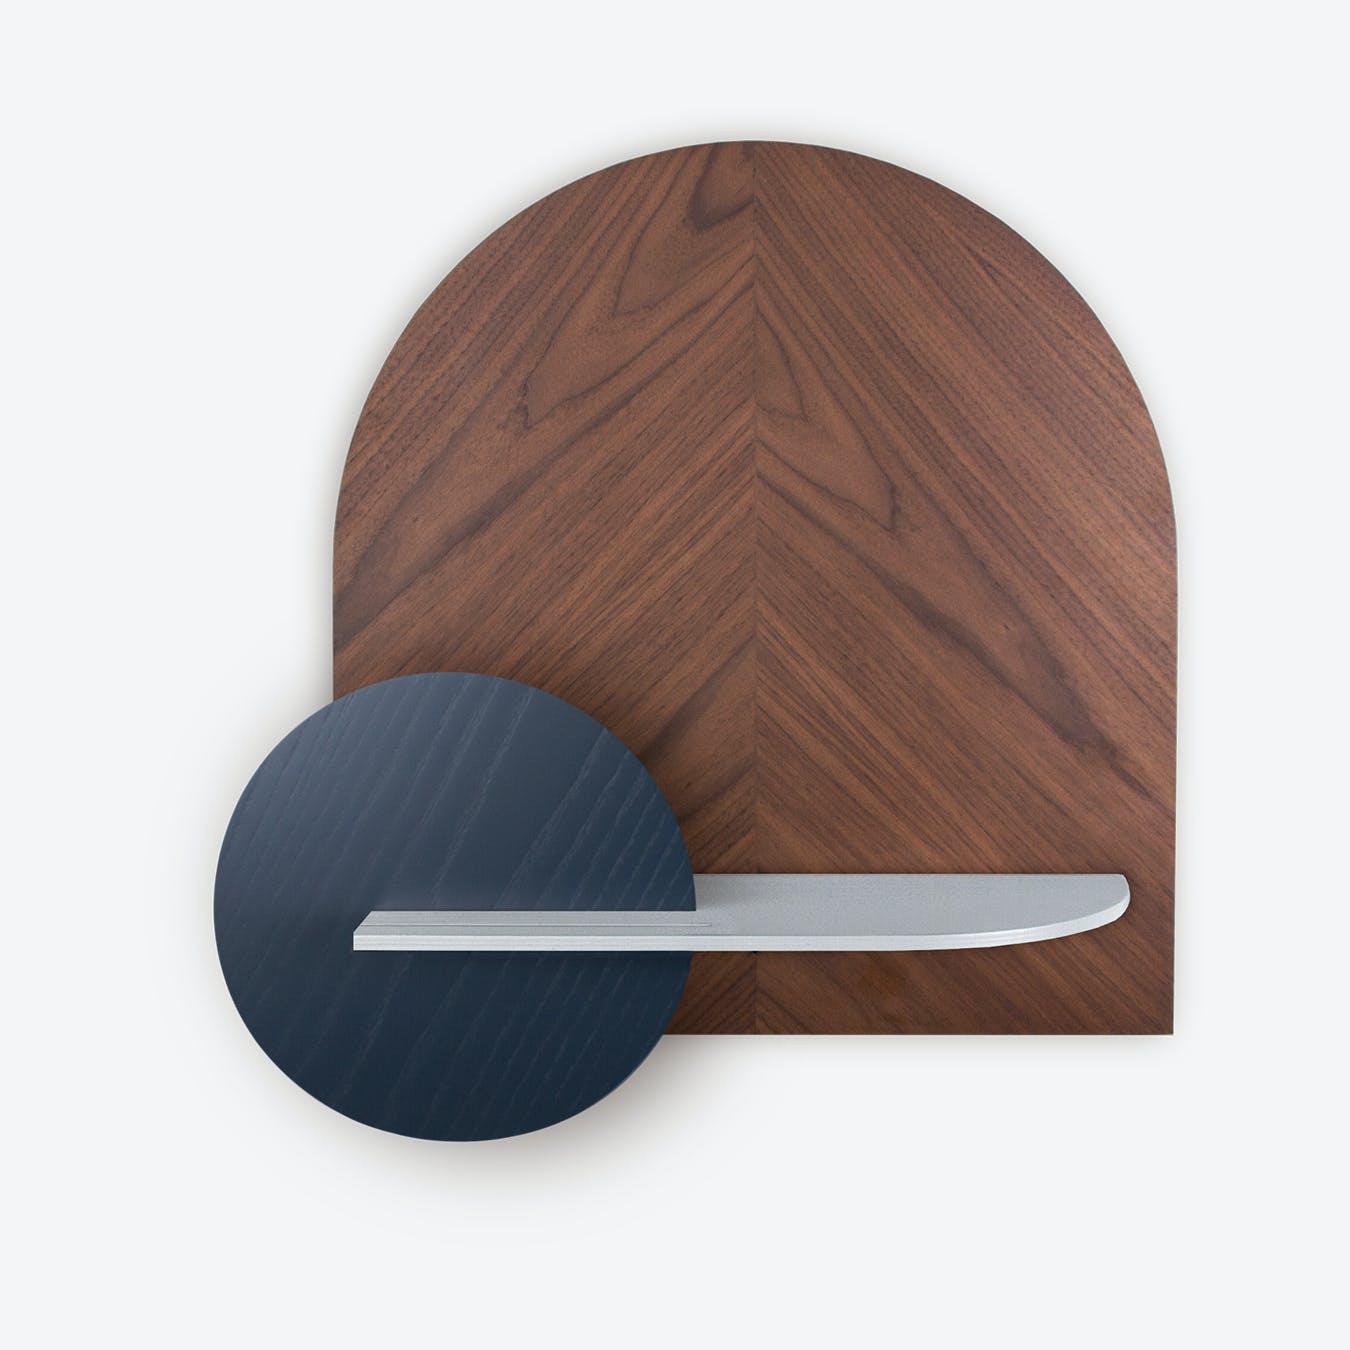 Alba M Herringbone Wall Shelf - Walnut/Grey/Blue